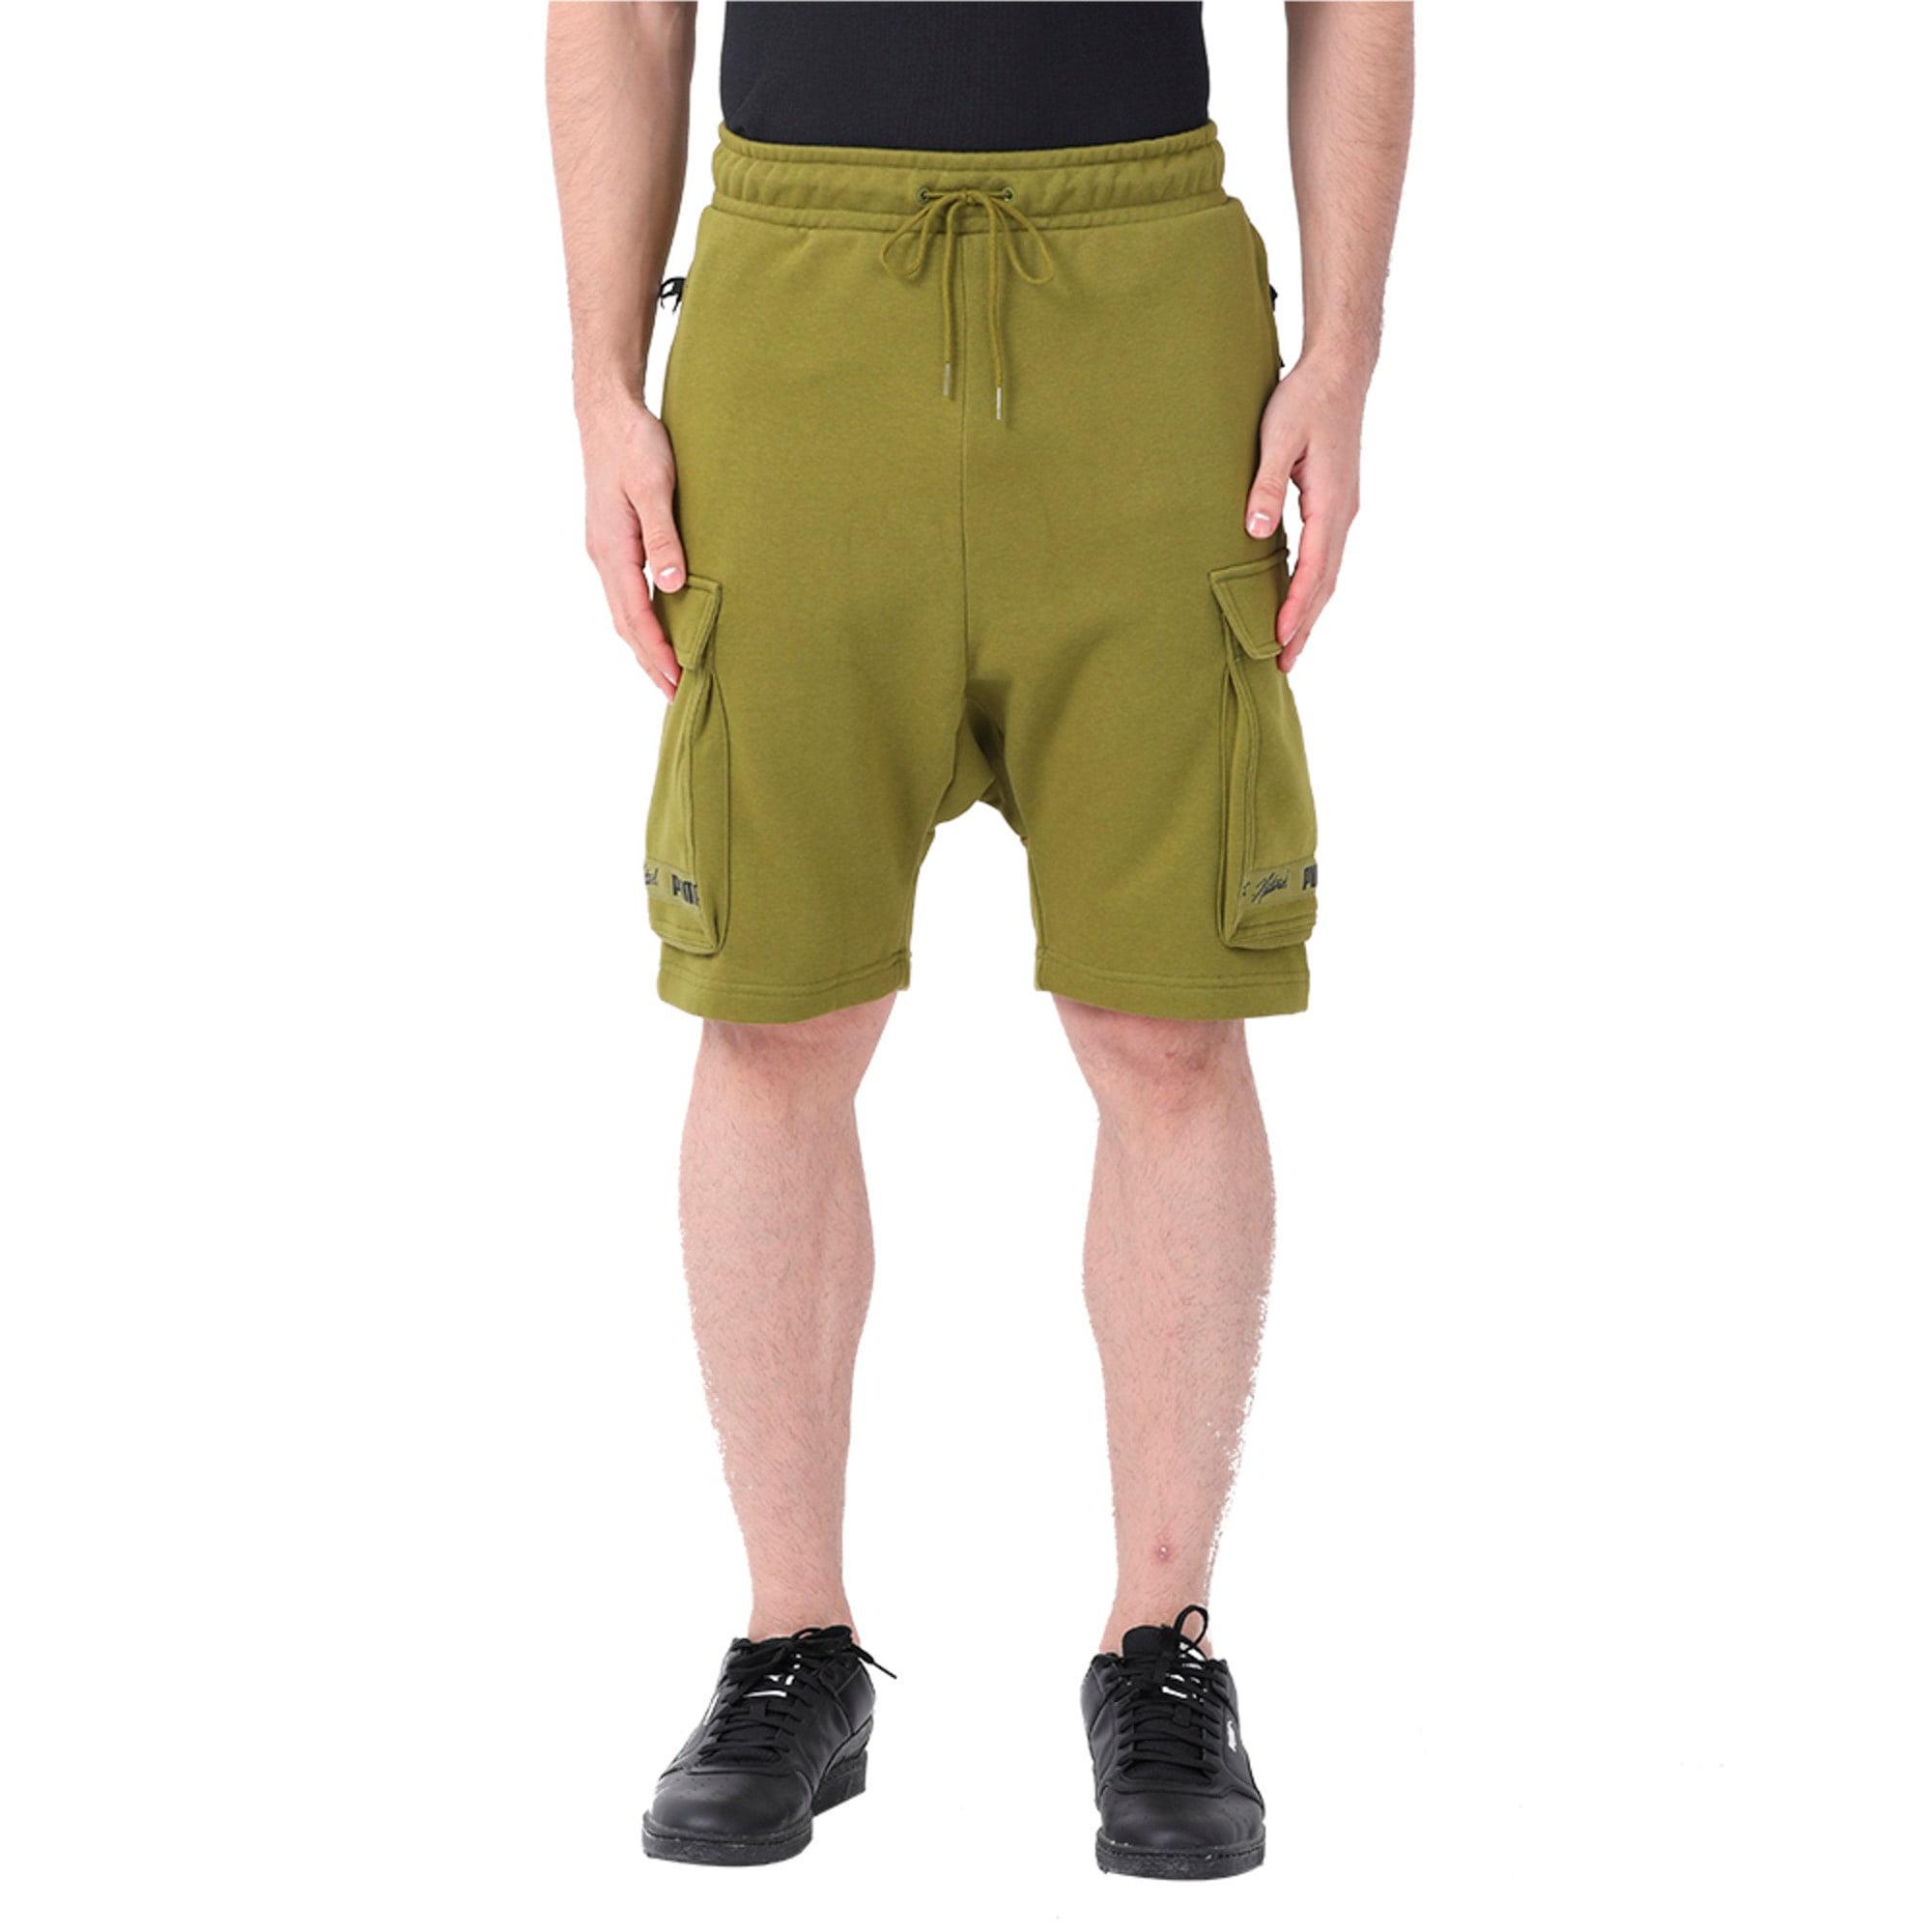 Thumbnail 4 of PUMA x NATUREL Men's Shorts, Avocado, medium-IND